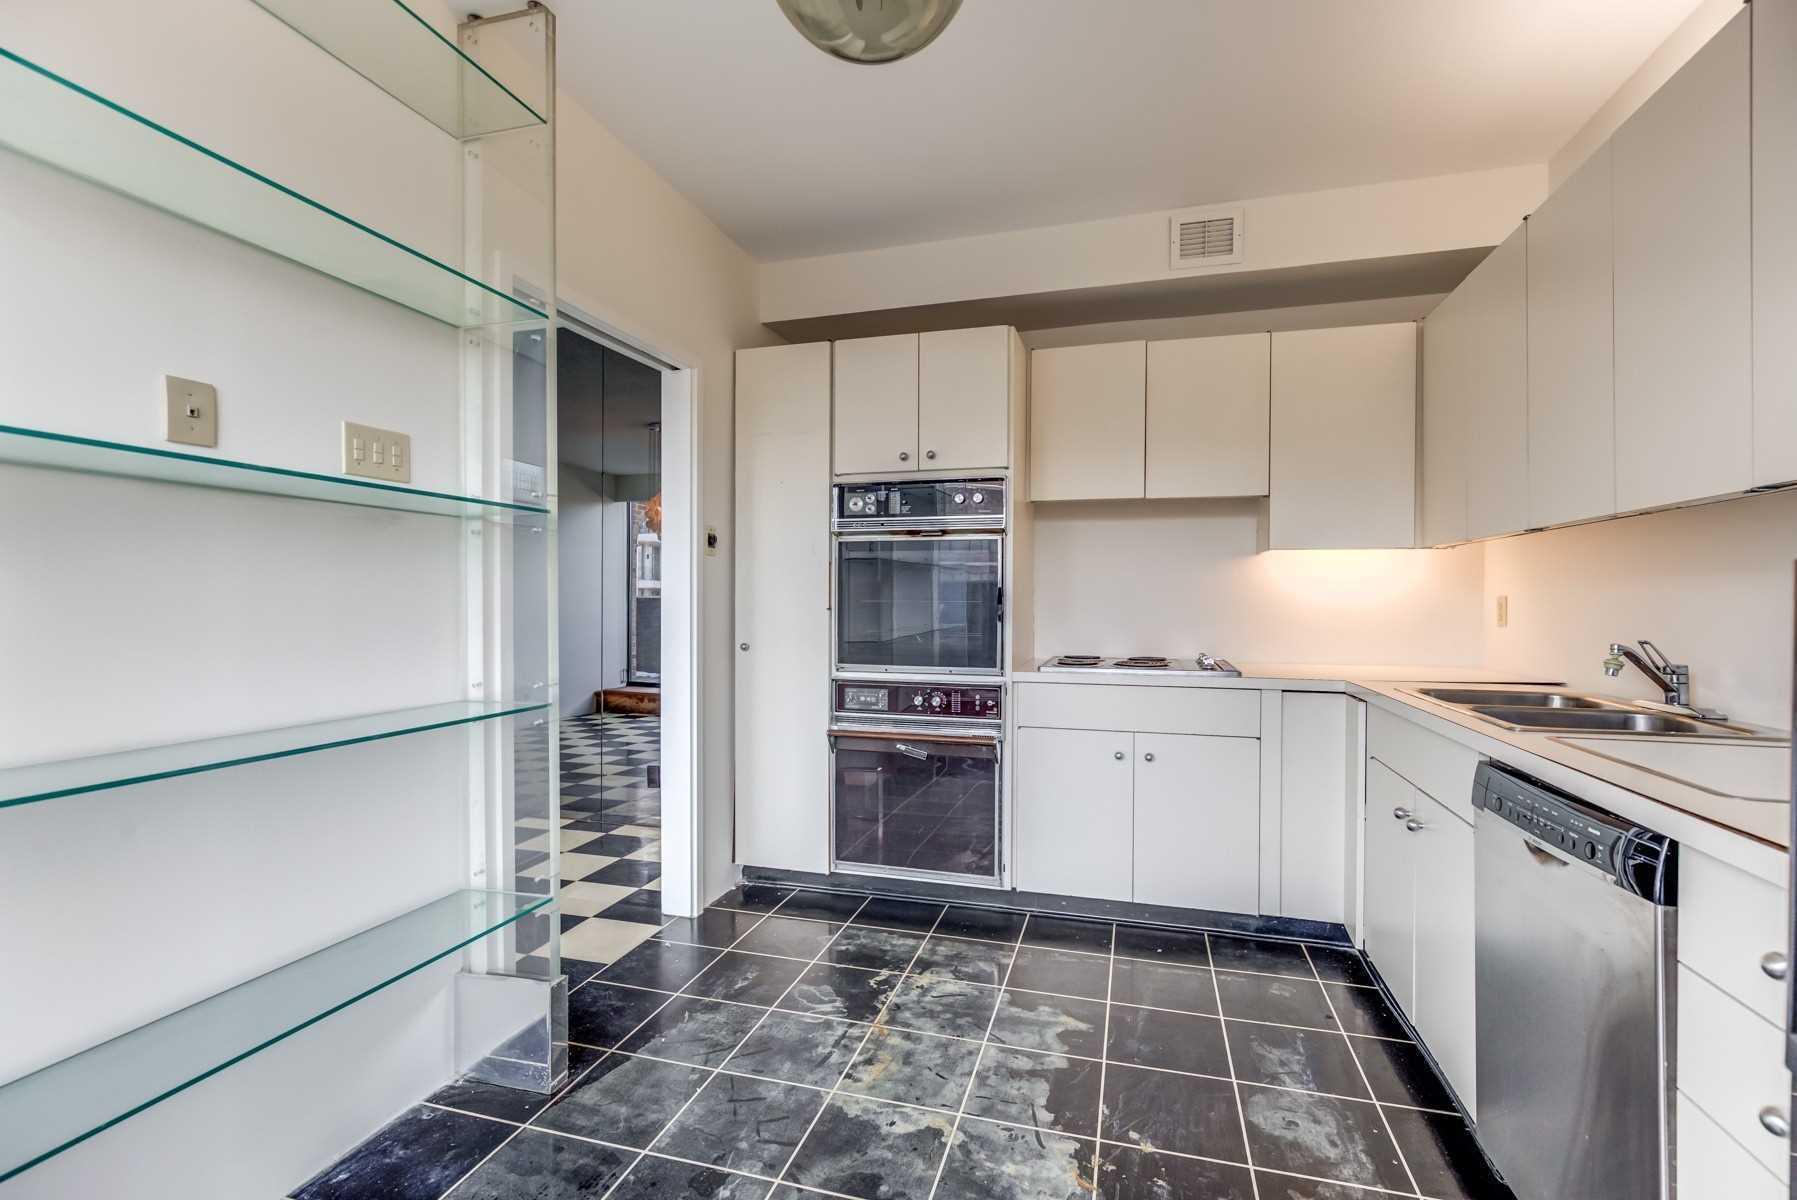 607 - 55A Avenue Rd - Annex Condo Apt for sale, 2 Bedrooms (C5185690) - #20